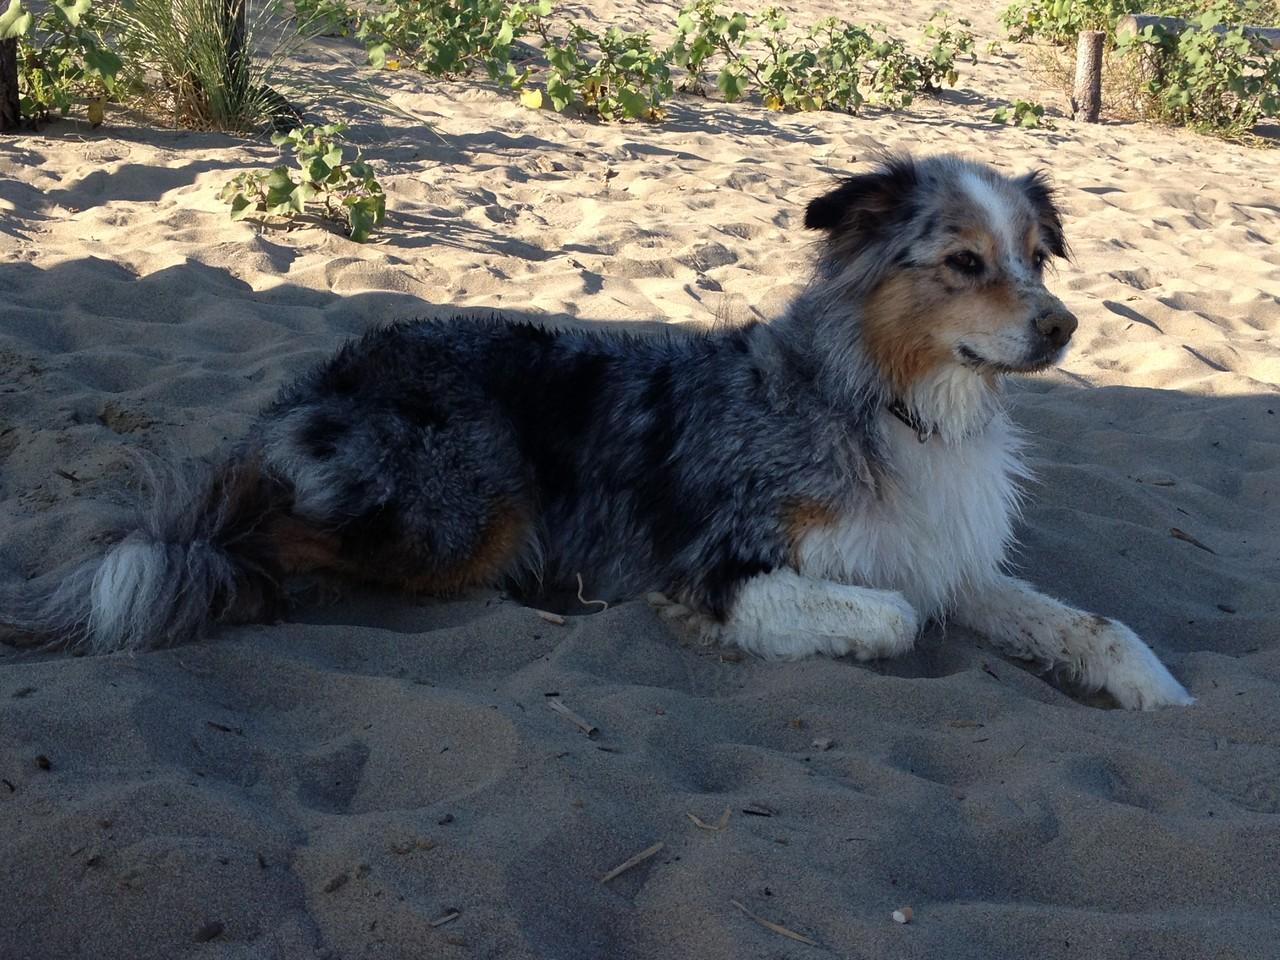 Den anderen Hunden beim Baden zusehen